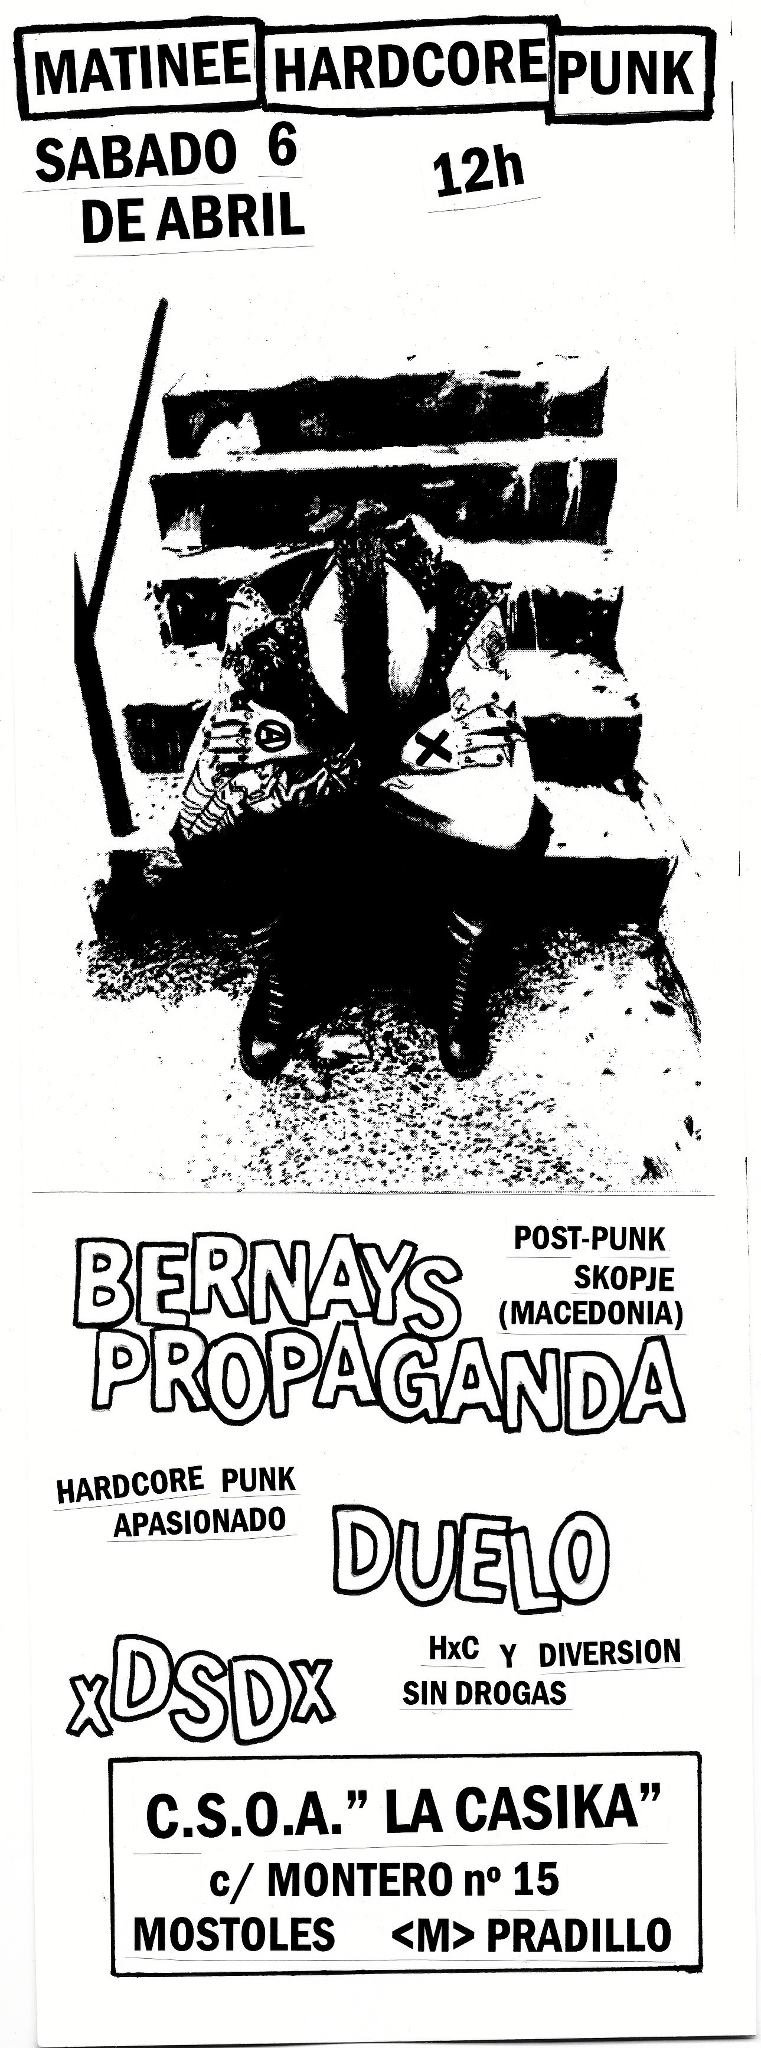 cartel Matinée Hardcore Punk - Sabado 6 abril 2013 en la Casika Móstoles